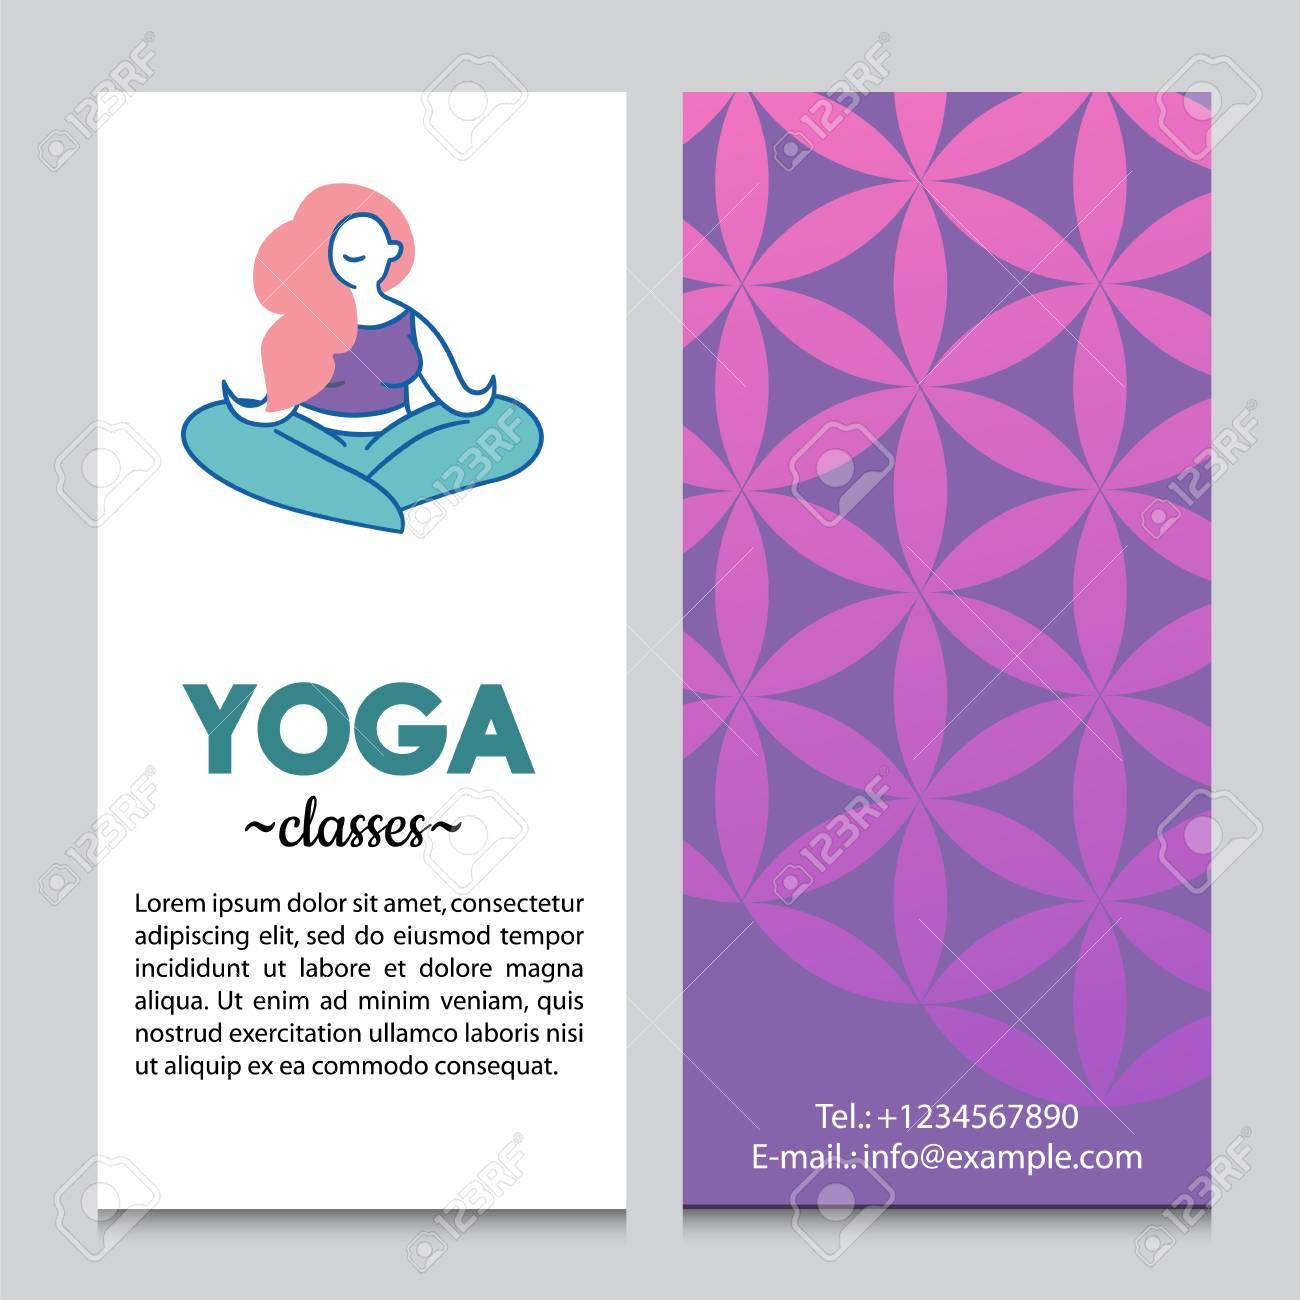 Banner Or Flyer Template For Yoga Retreat Or Yoga Studio, Flower ...